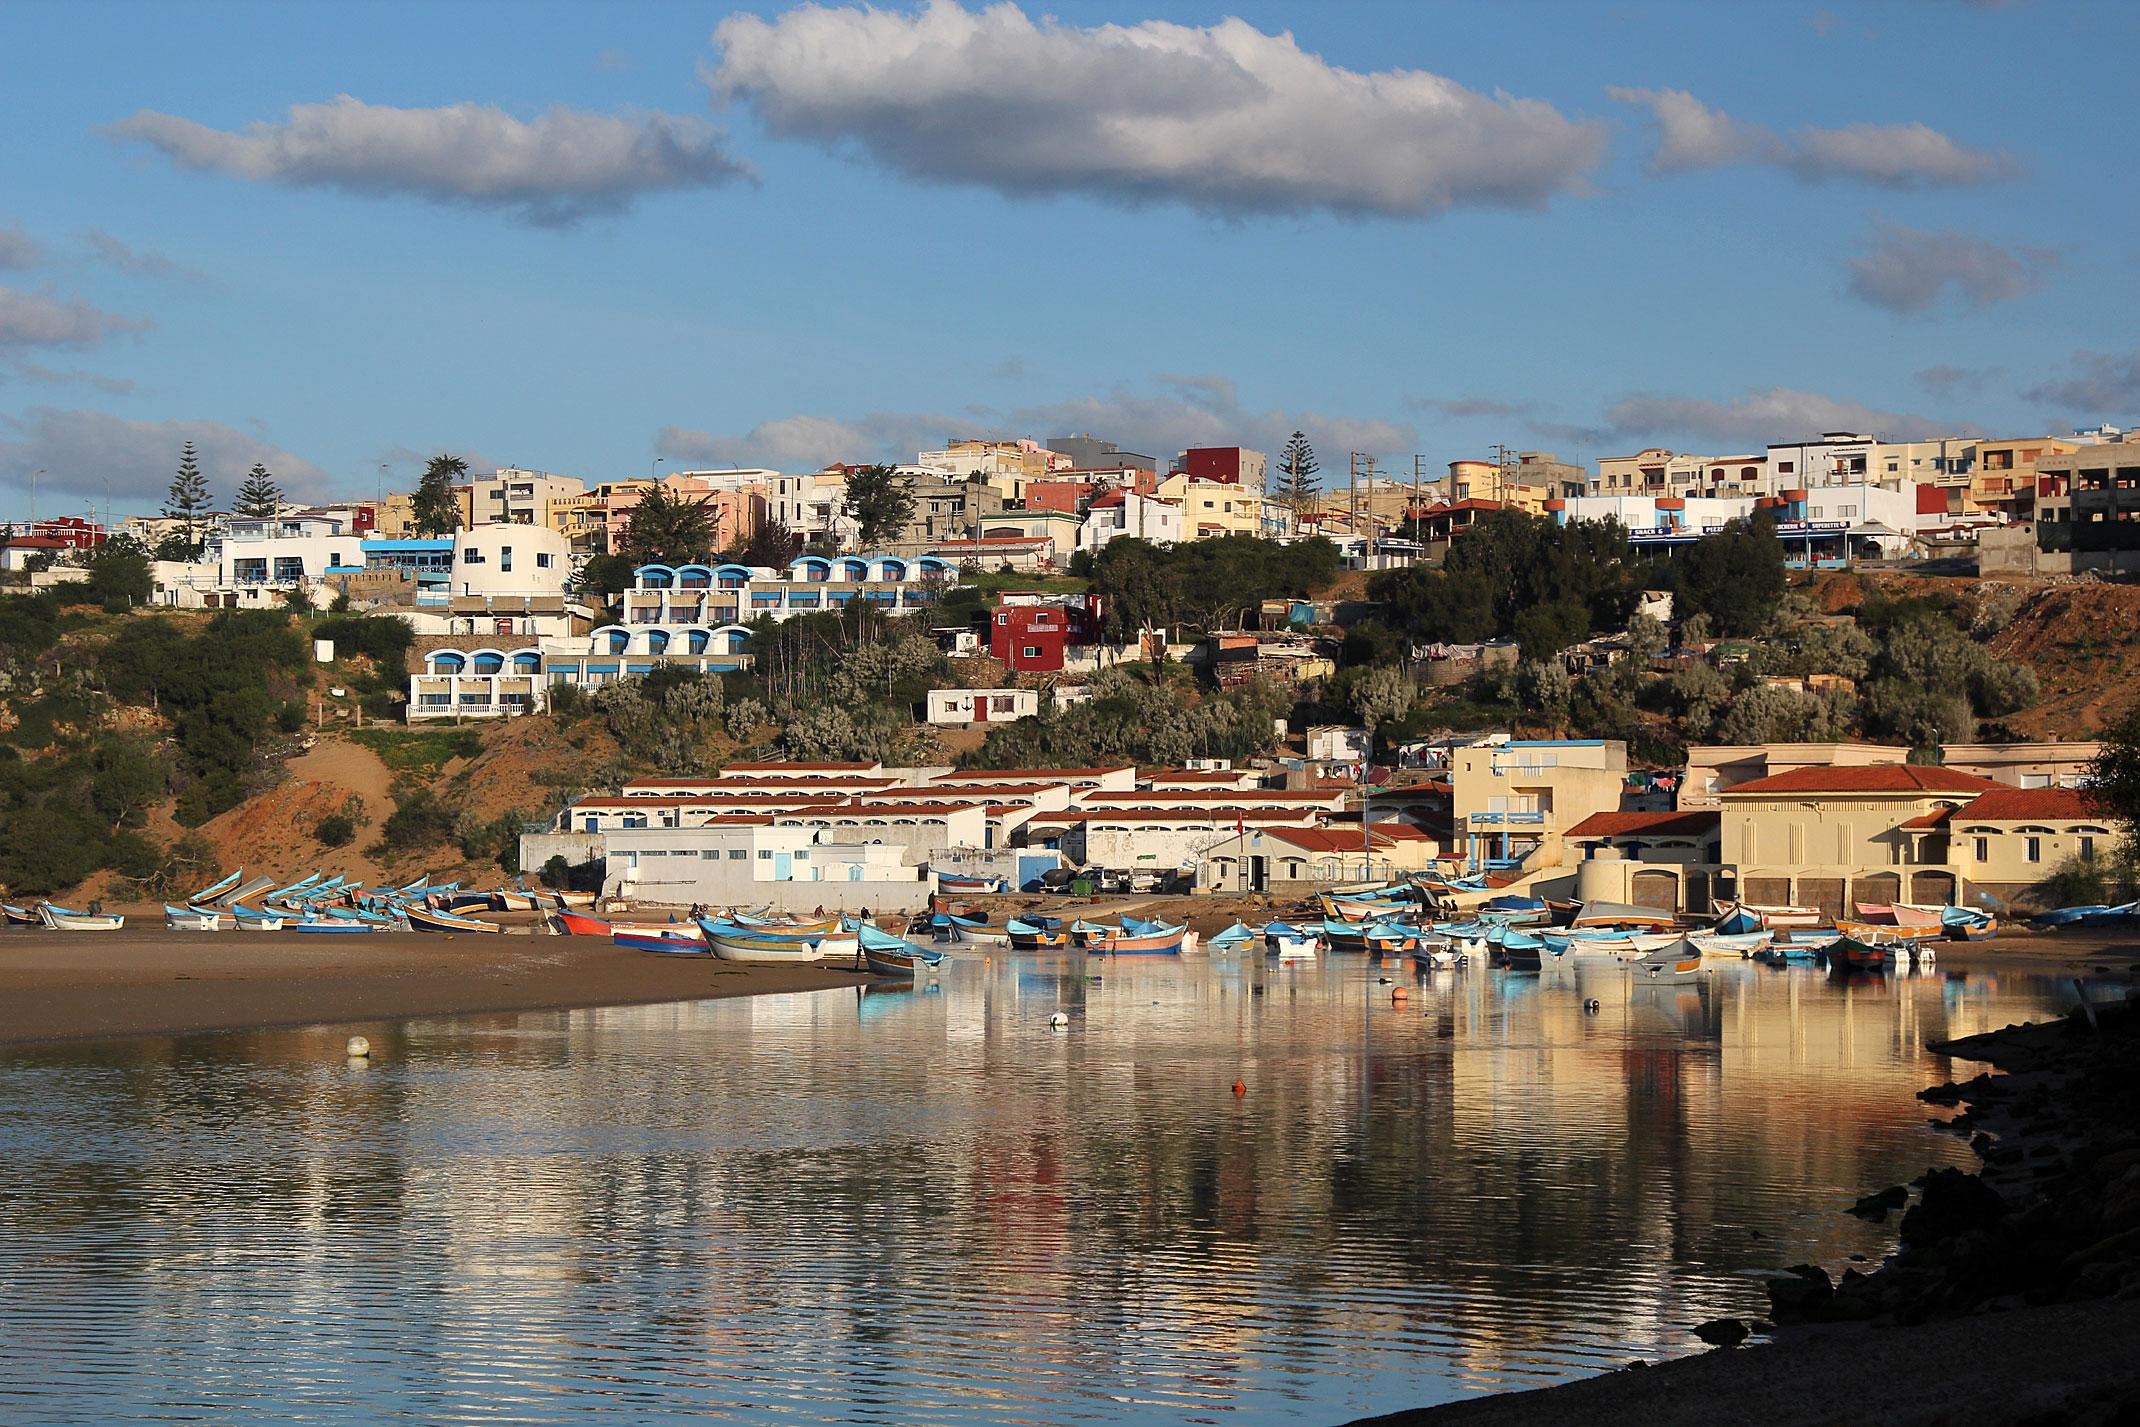 Maroko.Boulay Bousselham